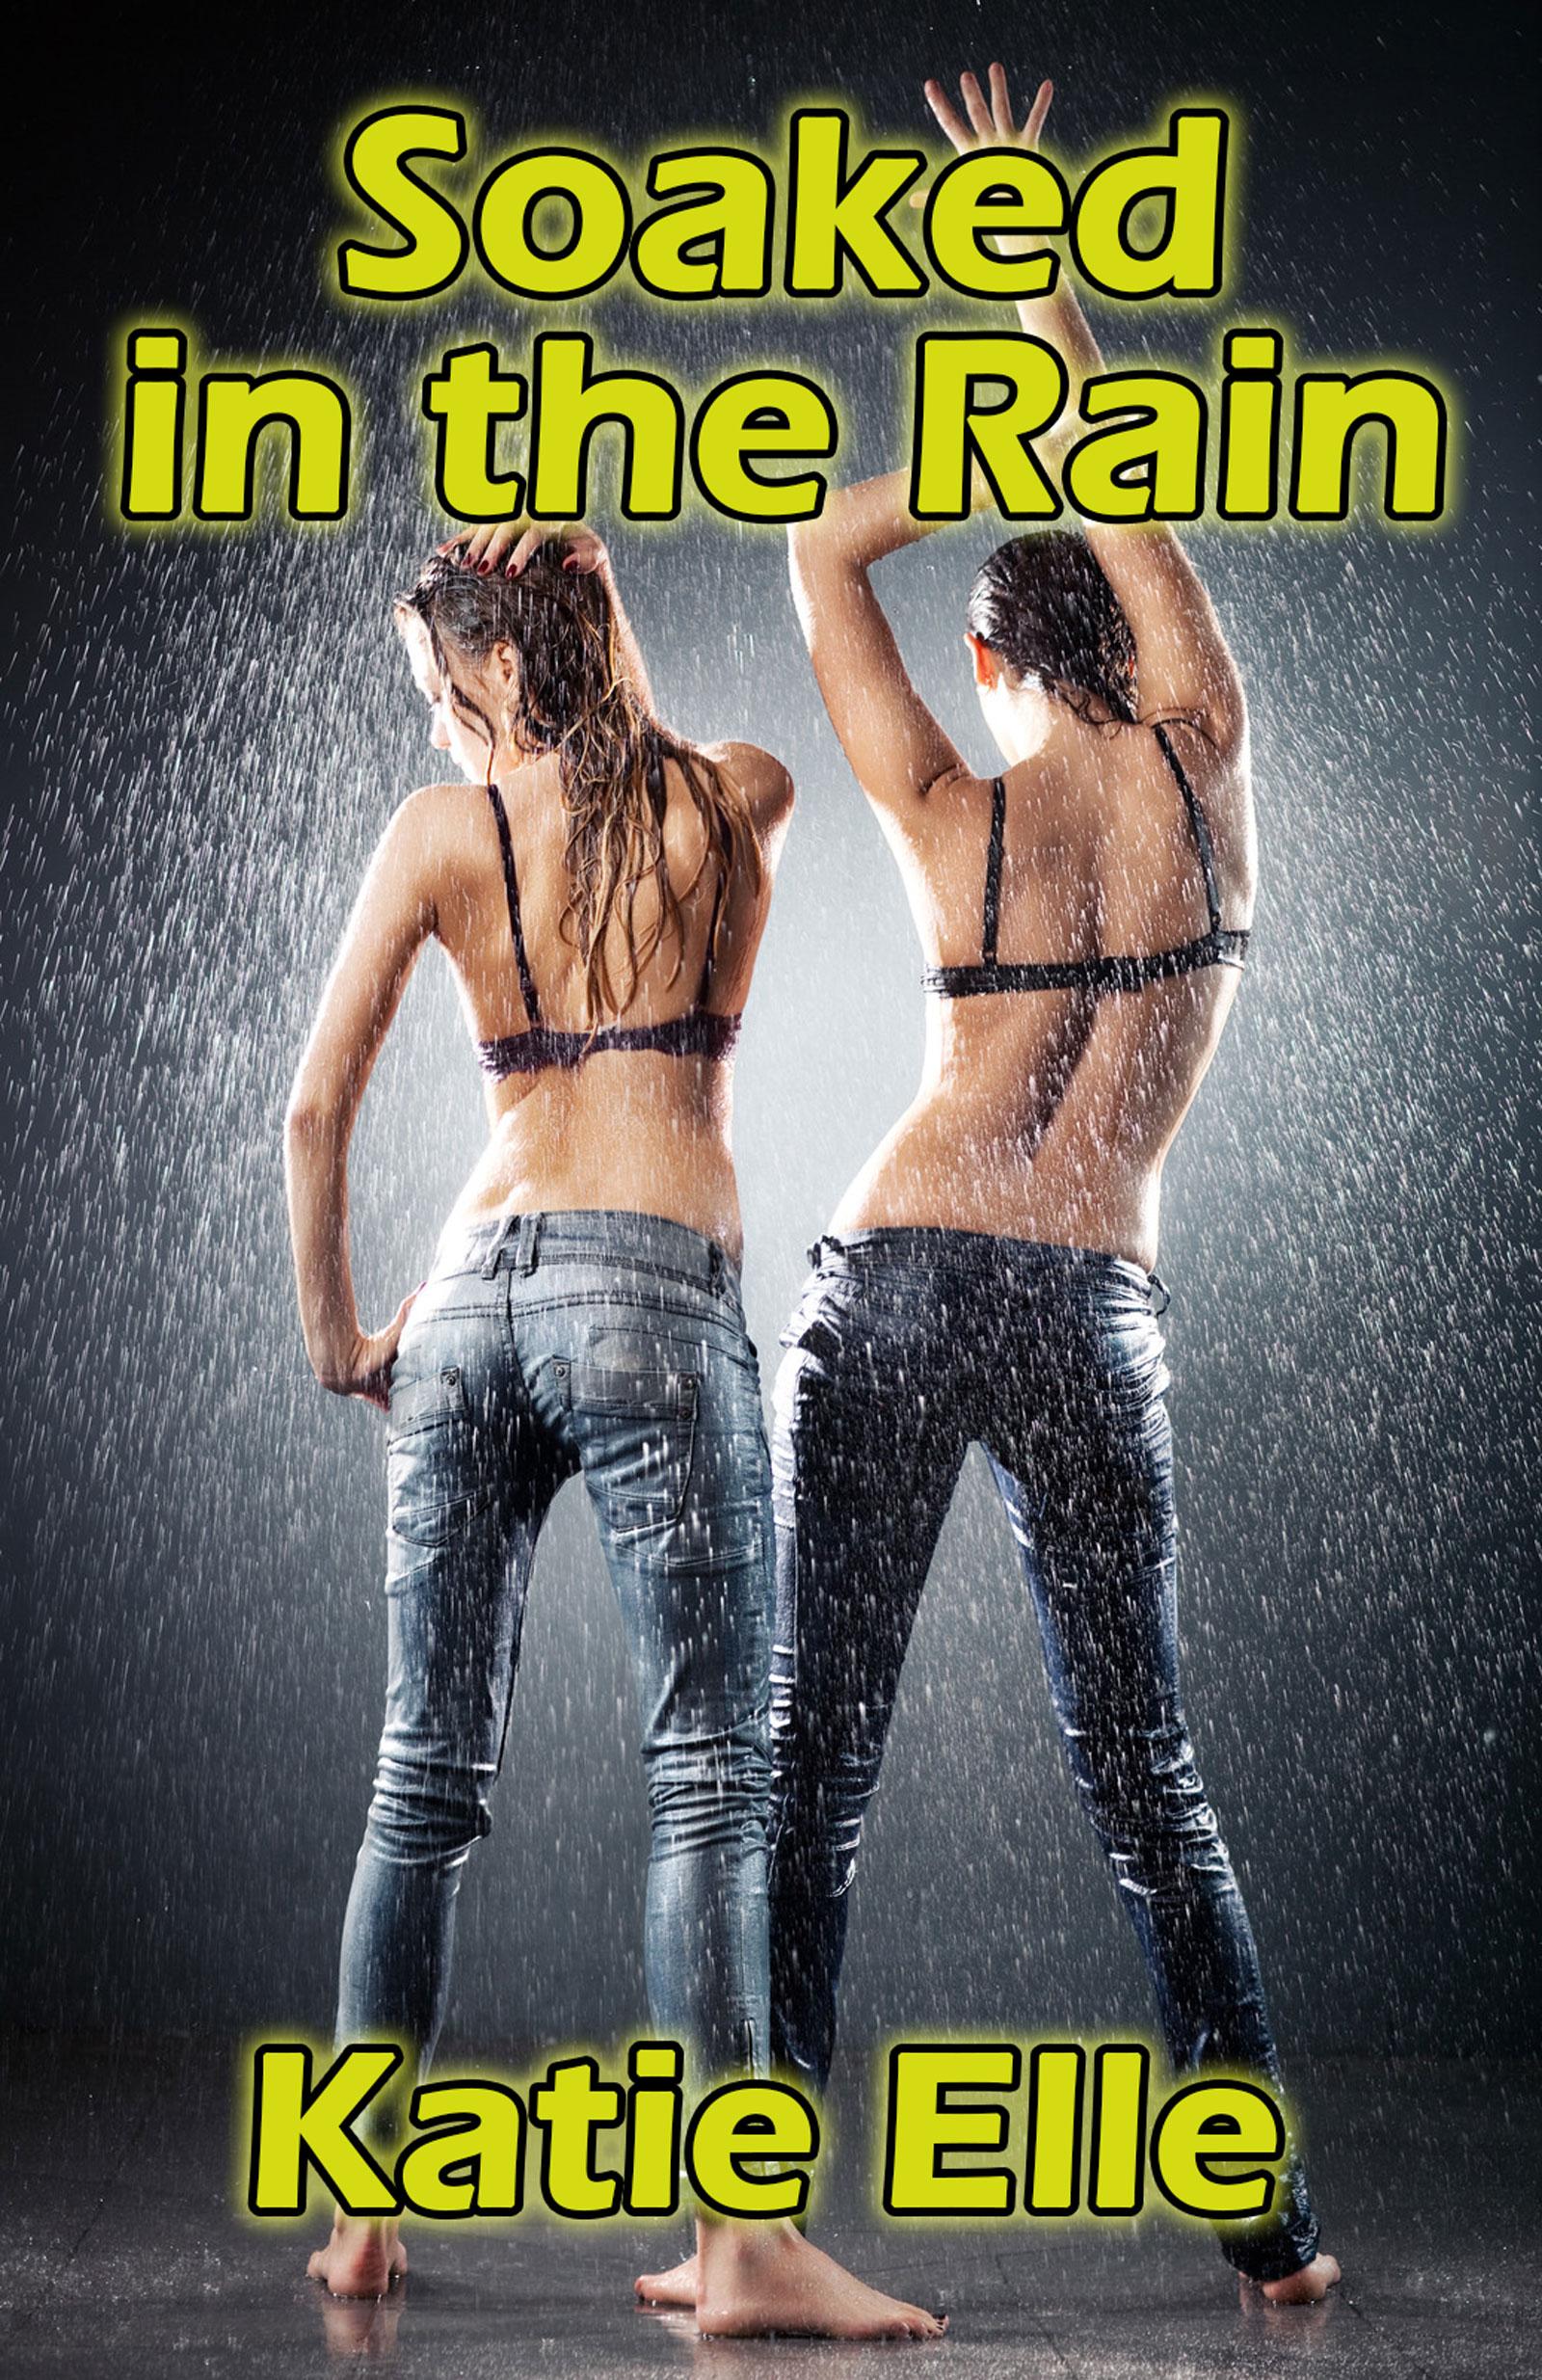 Katie Elle - Soaked in the Rain